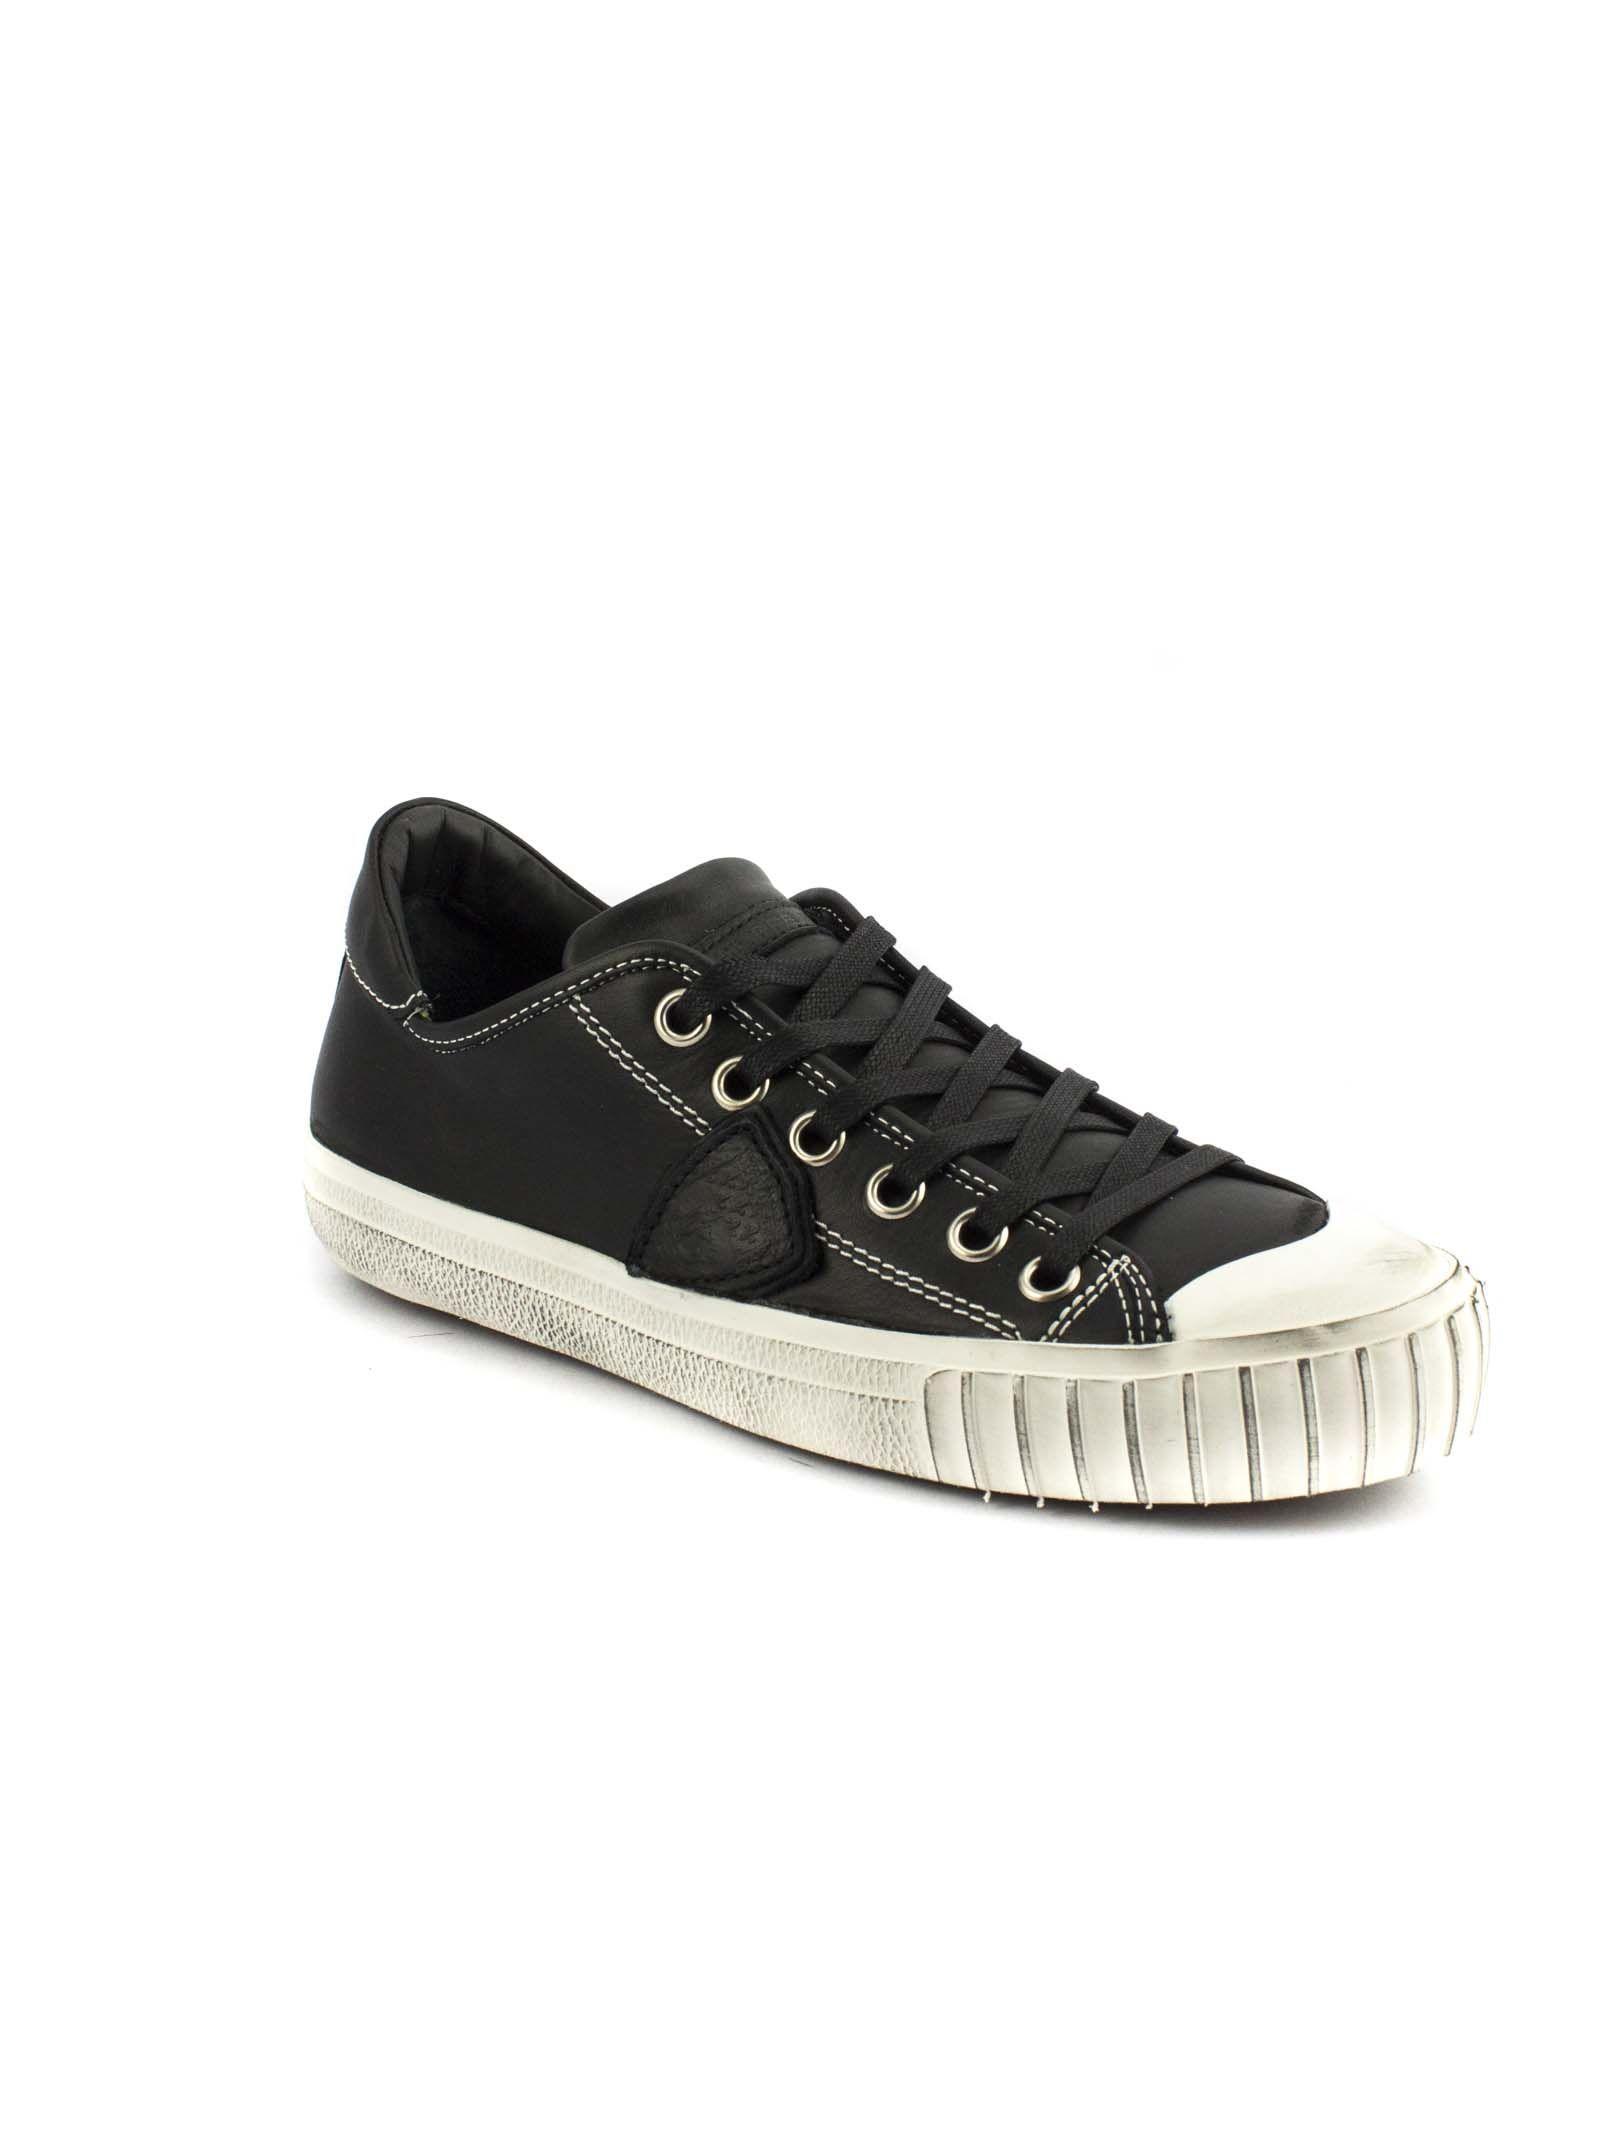 Sneaker En Cuir Noir Gare j0kevKl